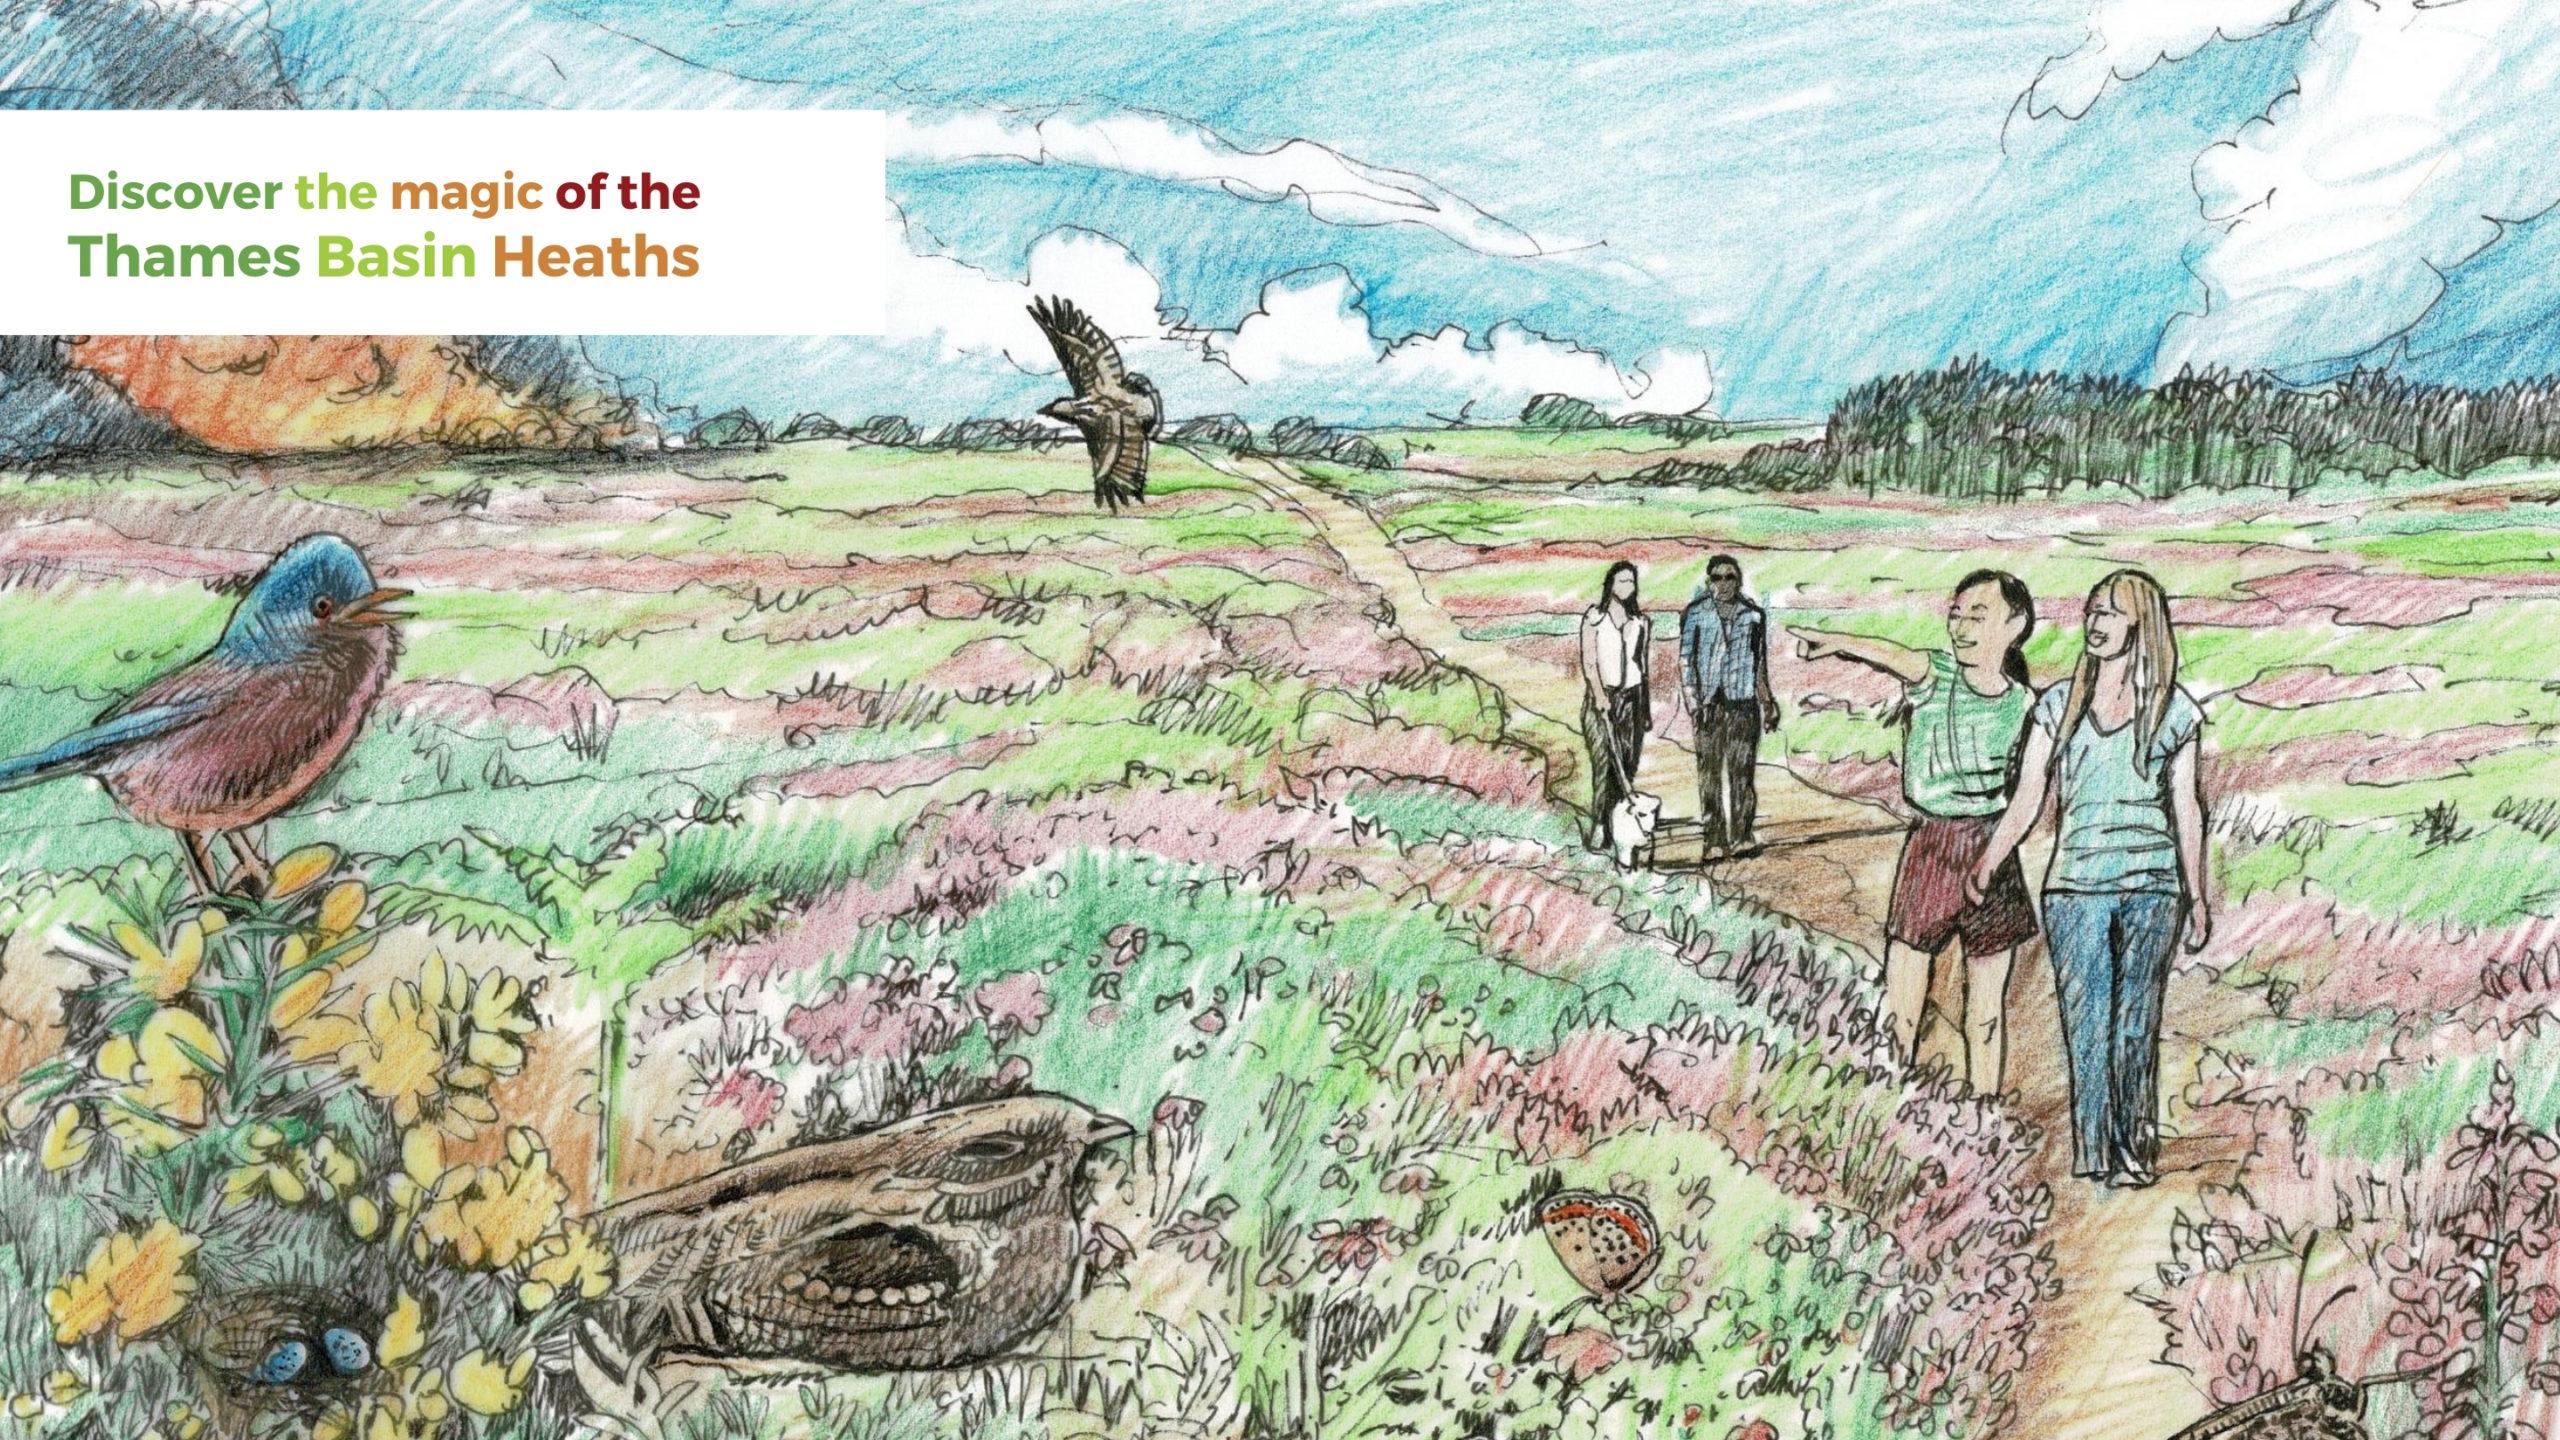 Heathland sketch by pangea-design.co.uk. Showing nightjar, Dartford warbler and woodlark.